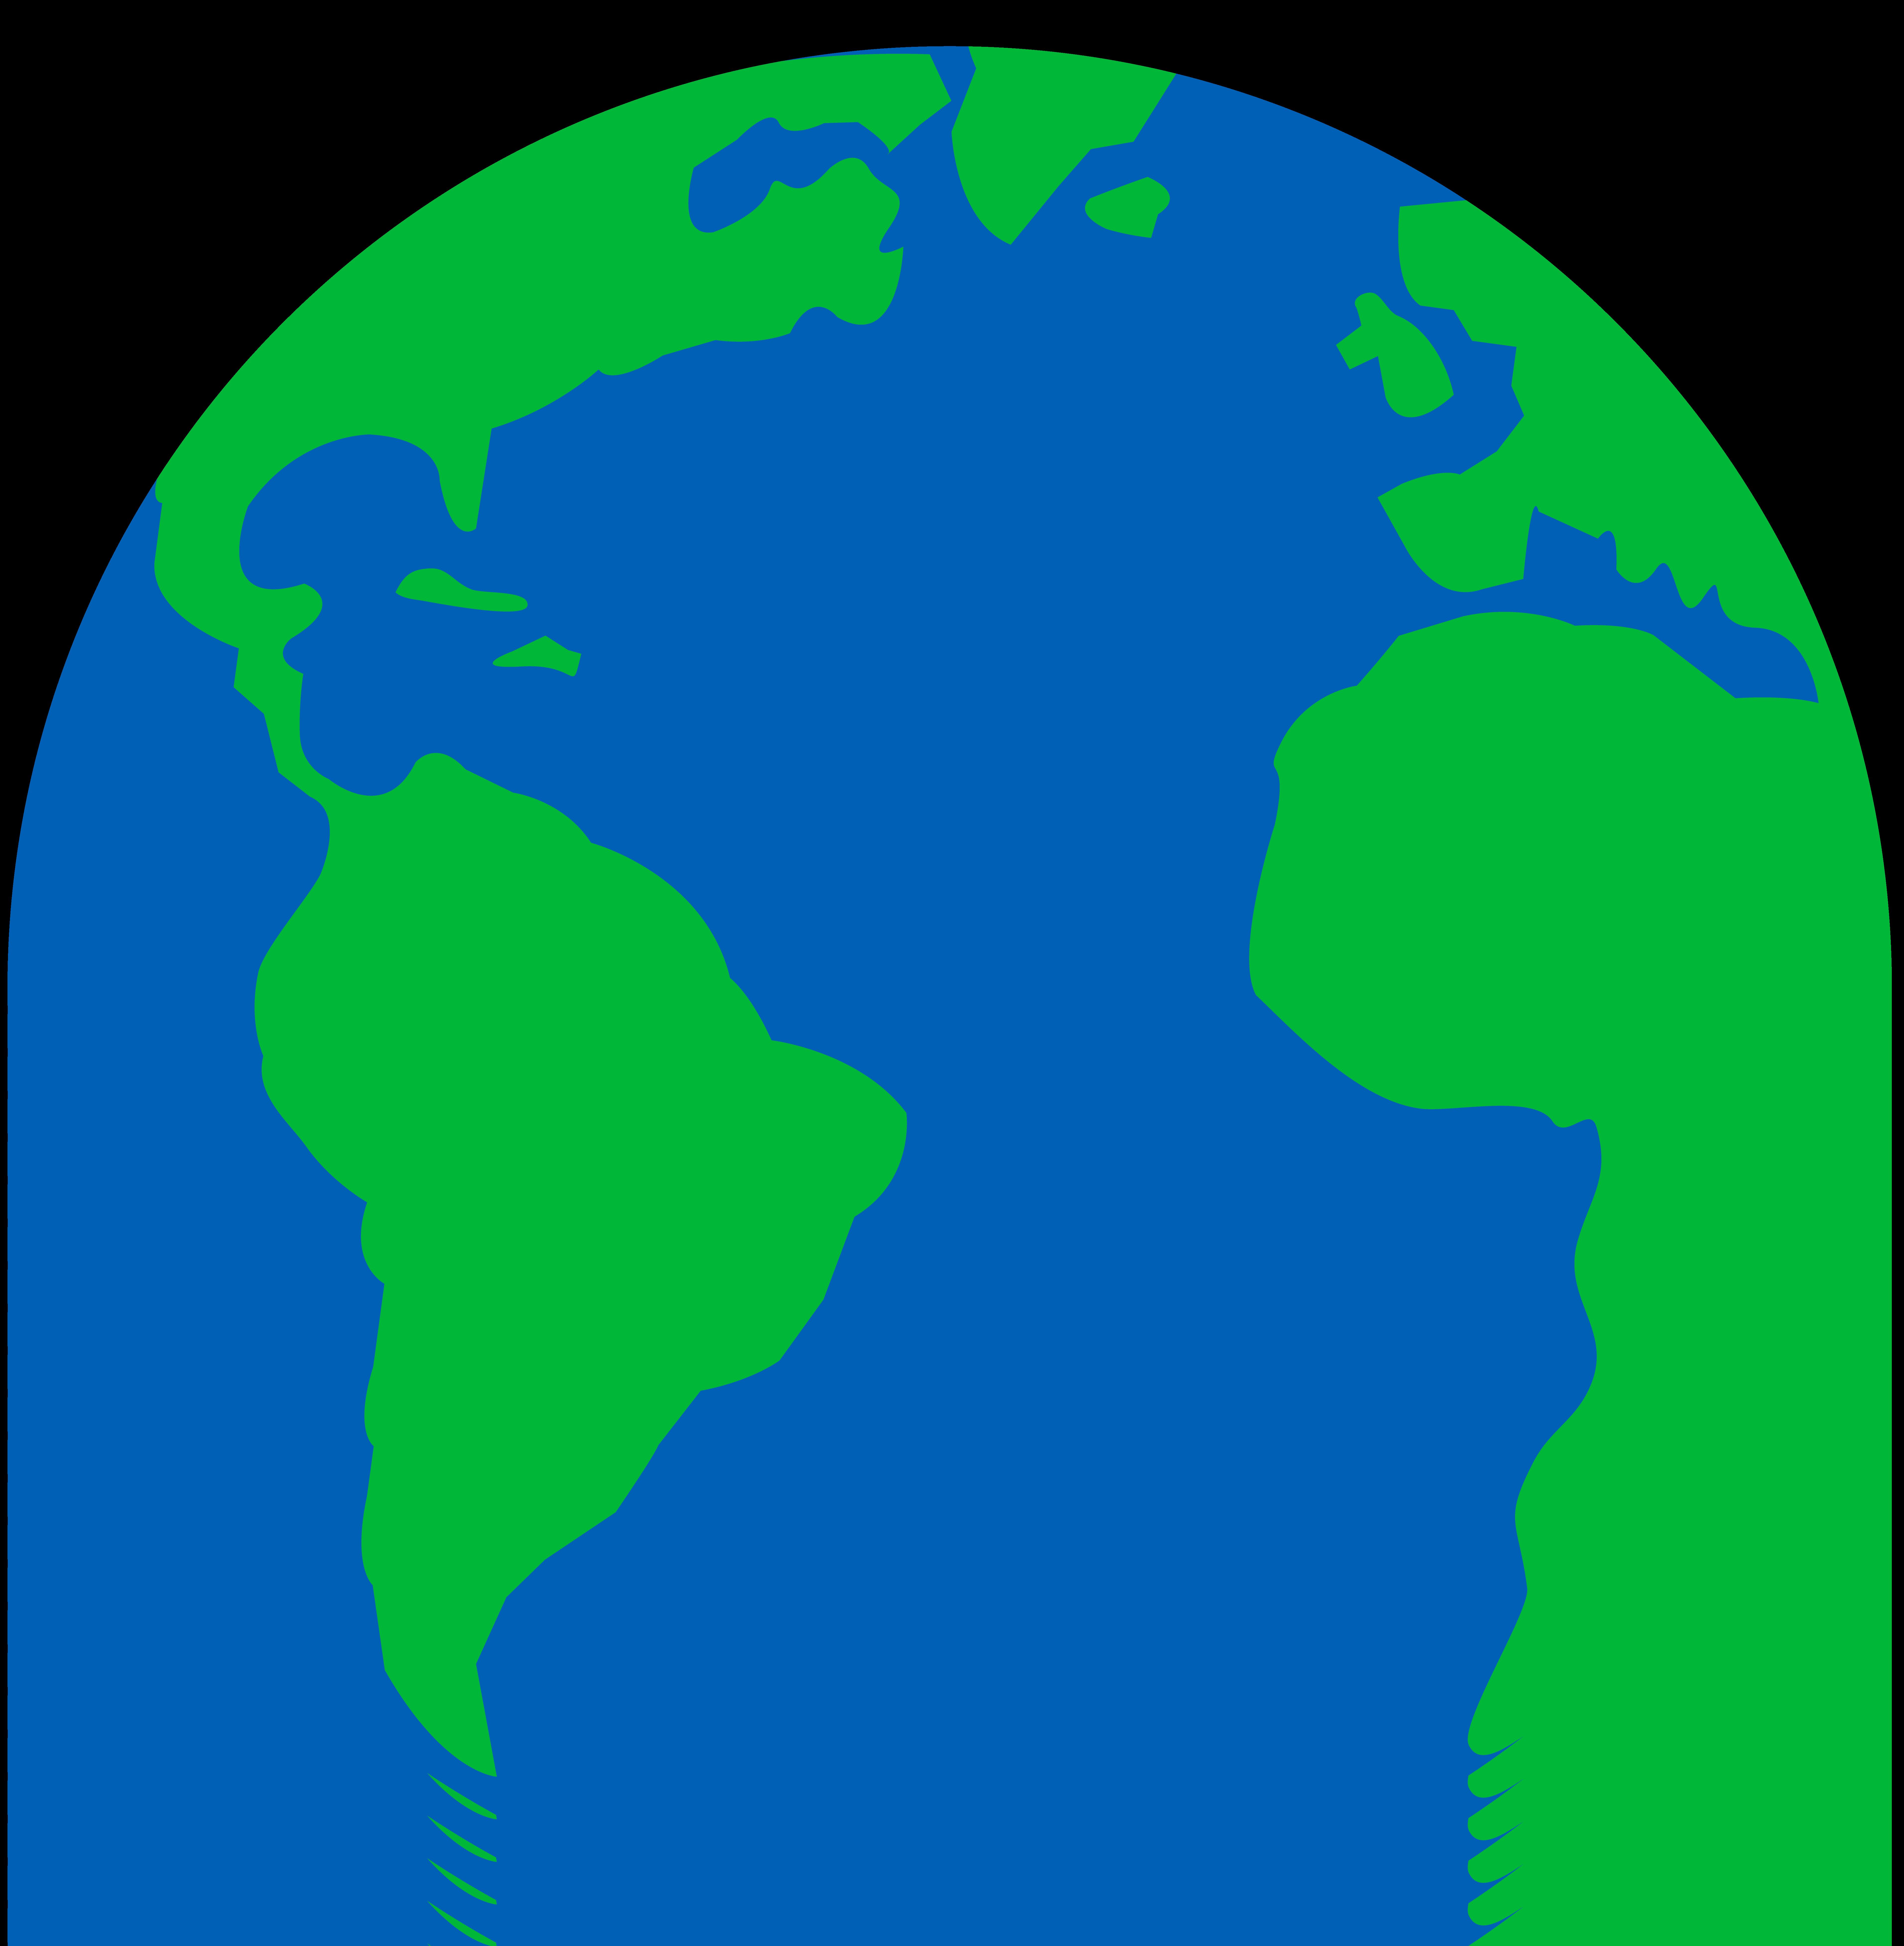 green earth clipart-green earth clipart-7